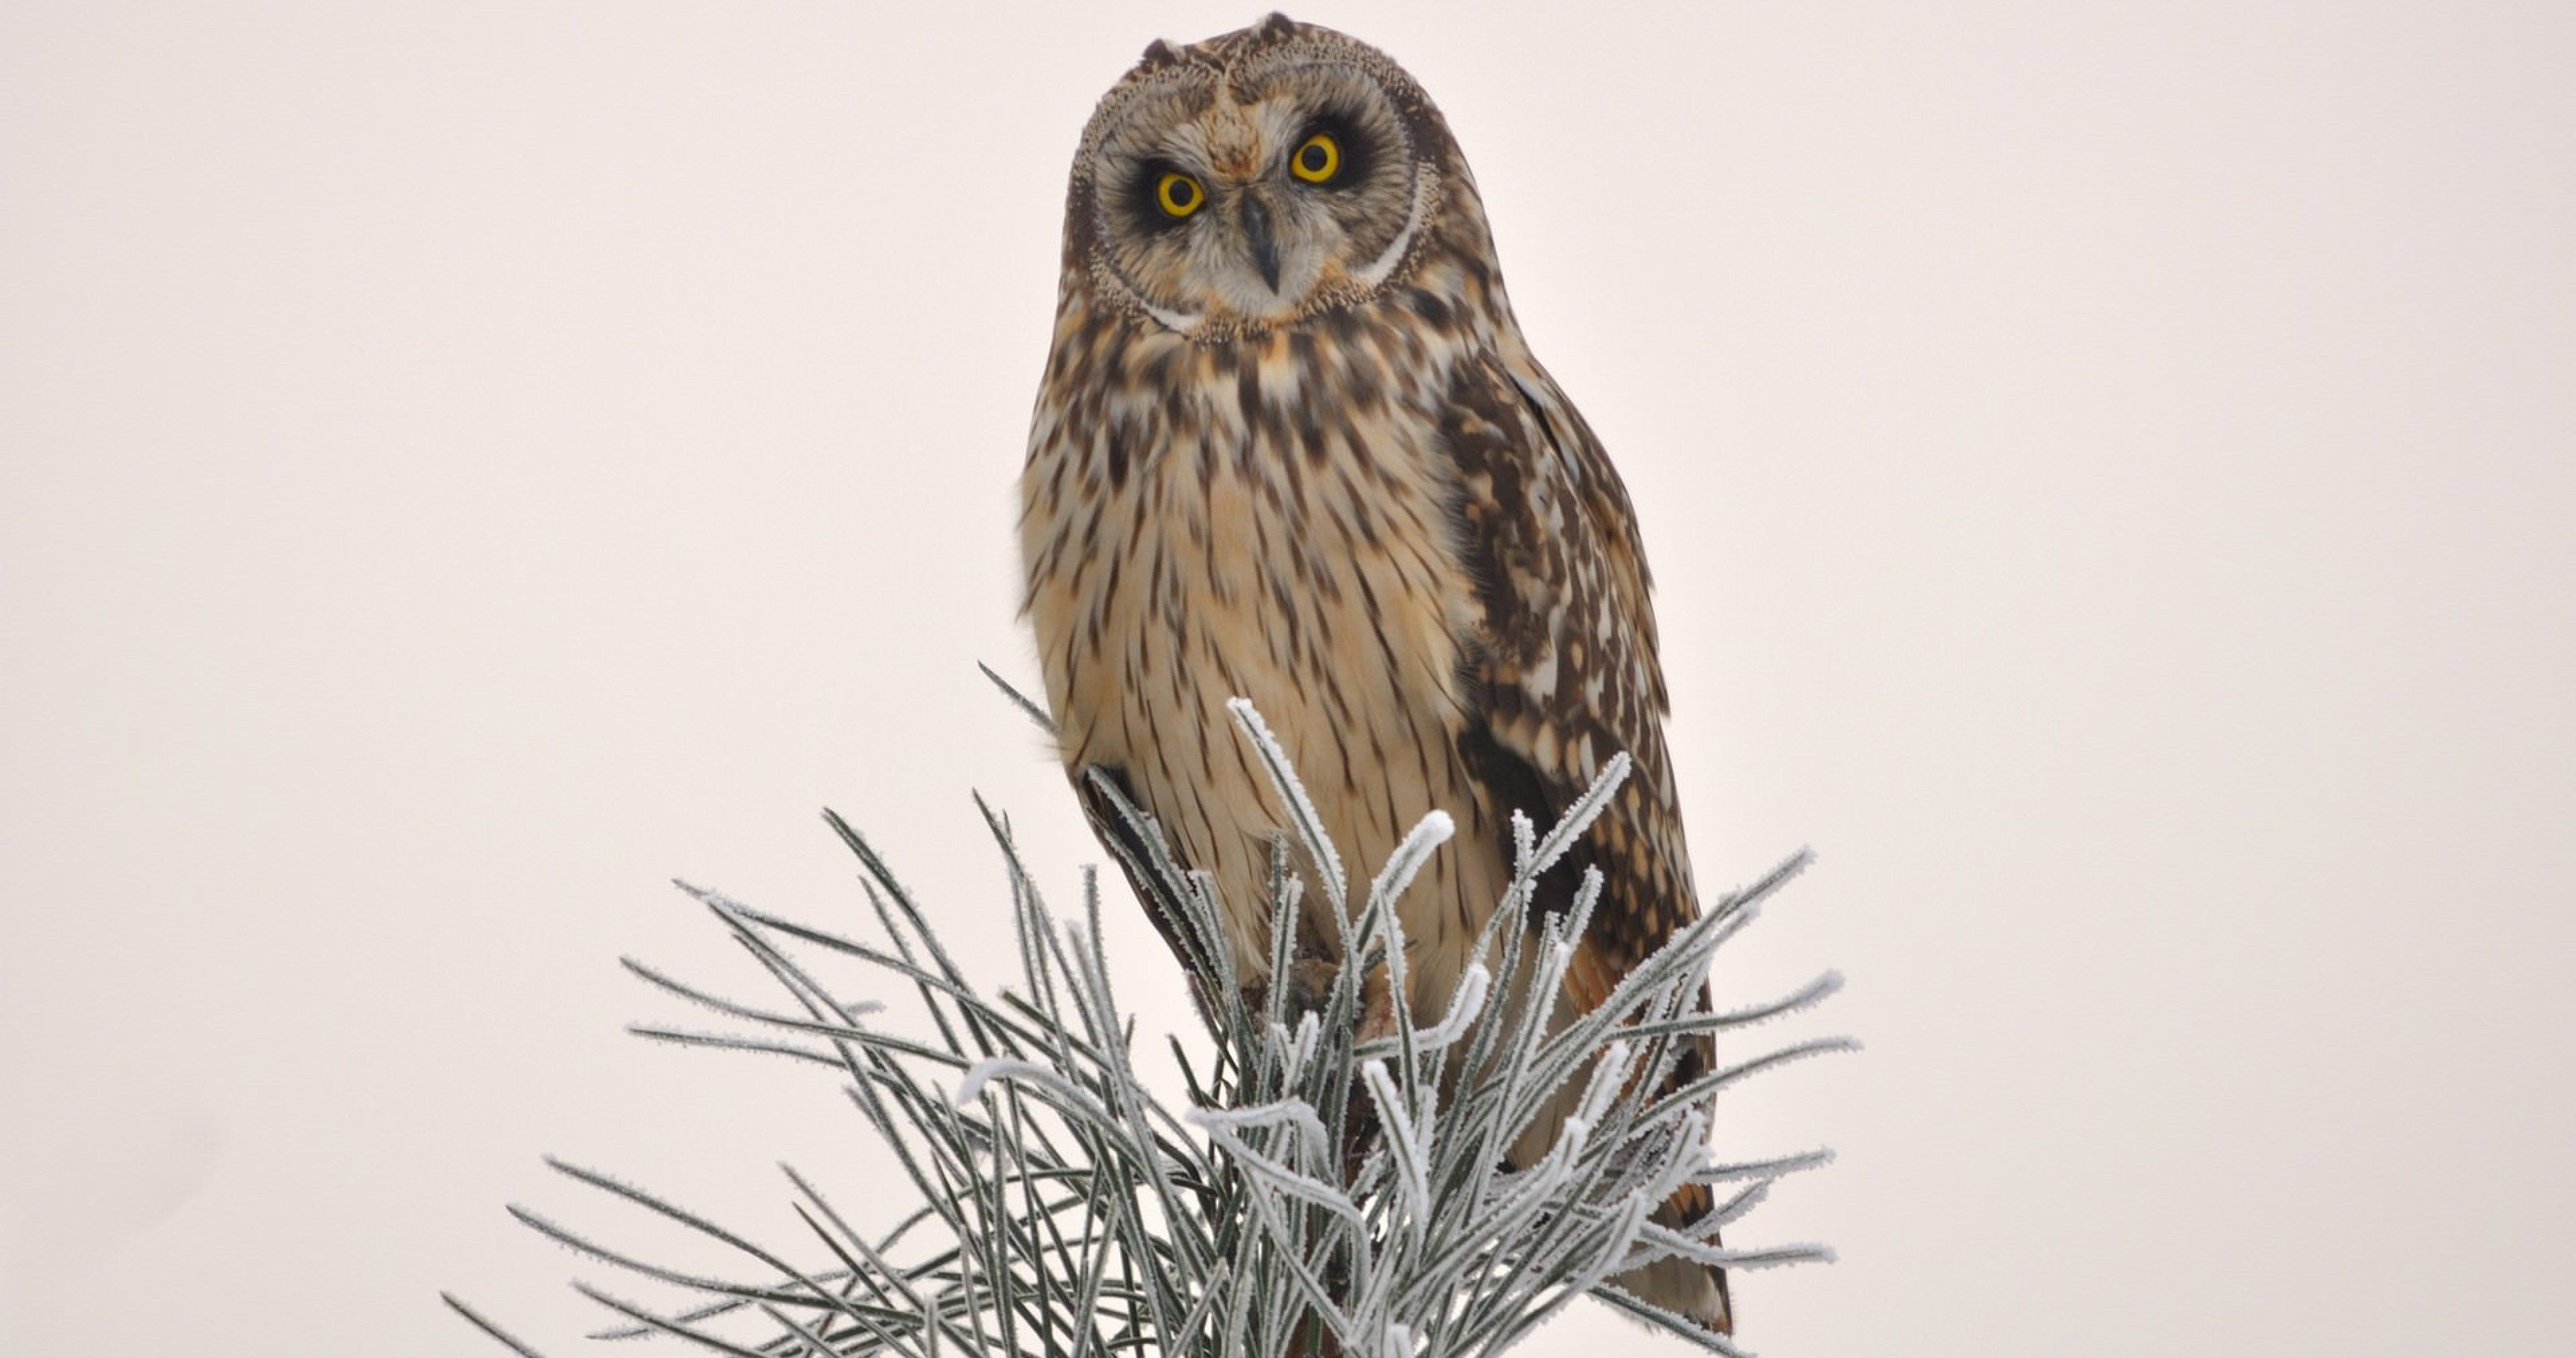 bird owl on tree wallpaper 4k ultra hd wallpaper Owl